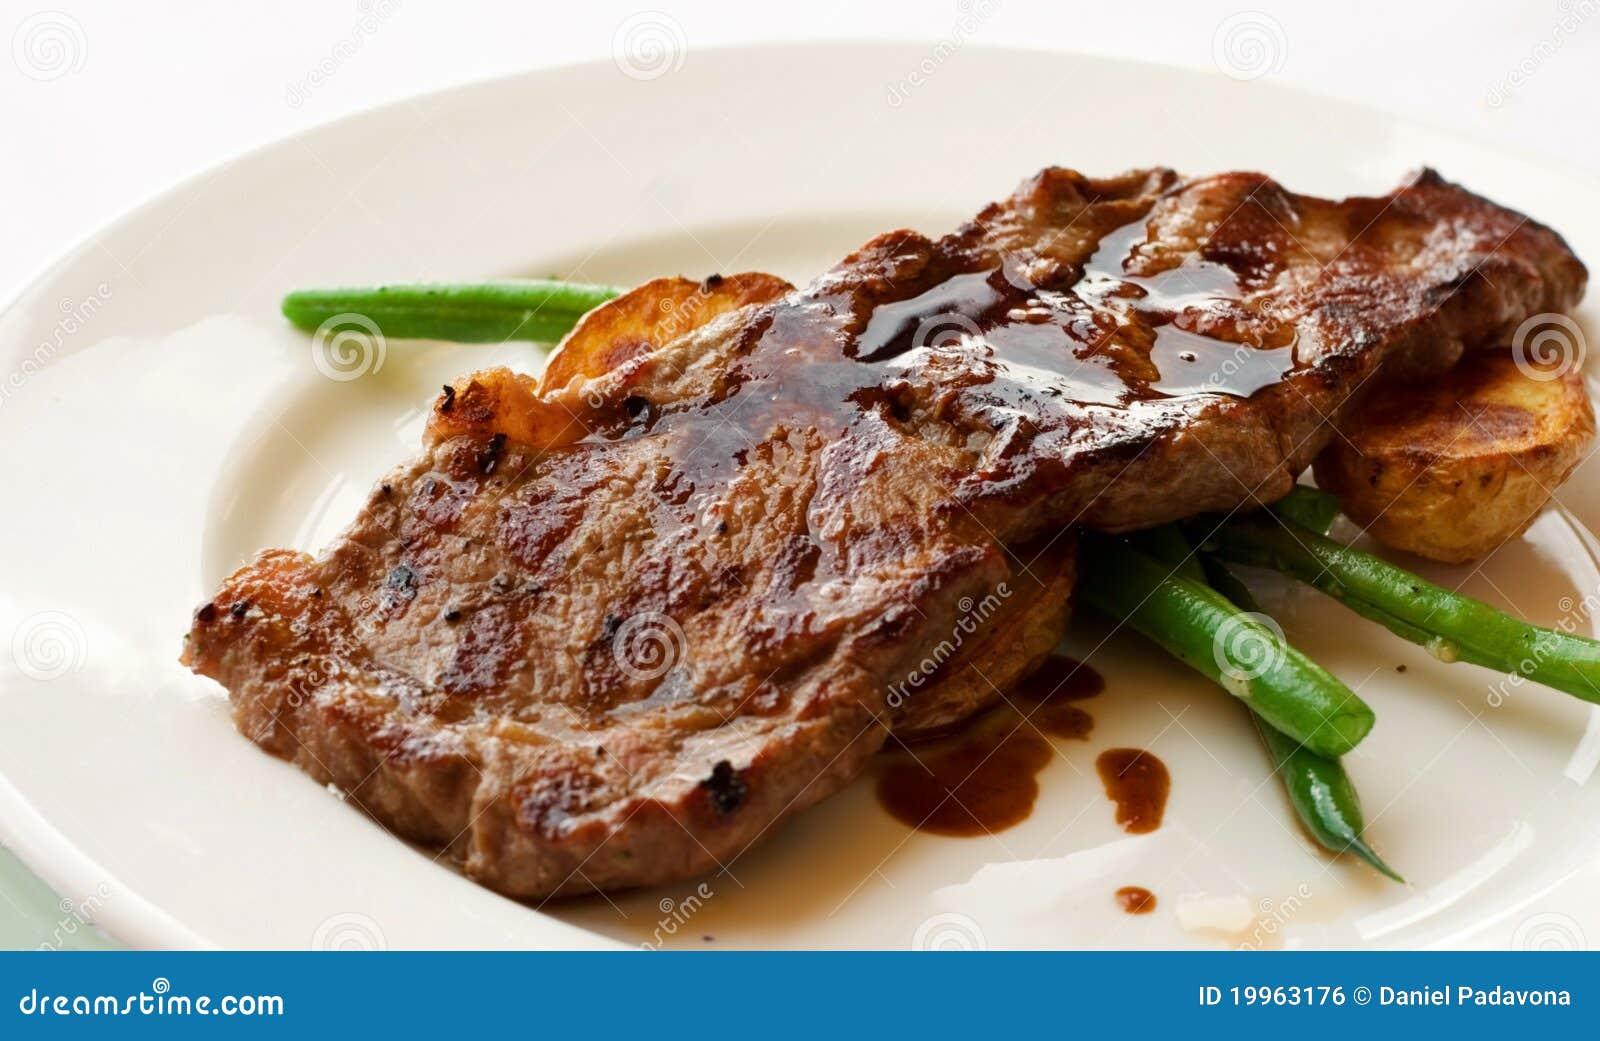 Gourmet Filet Mignon Steak